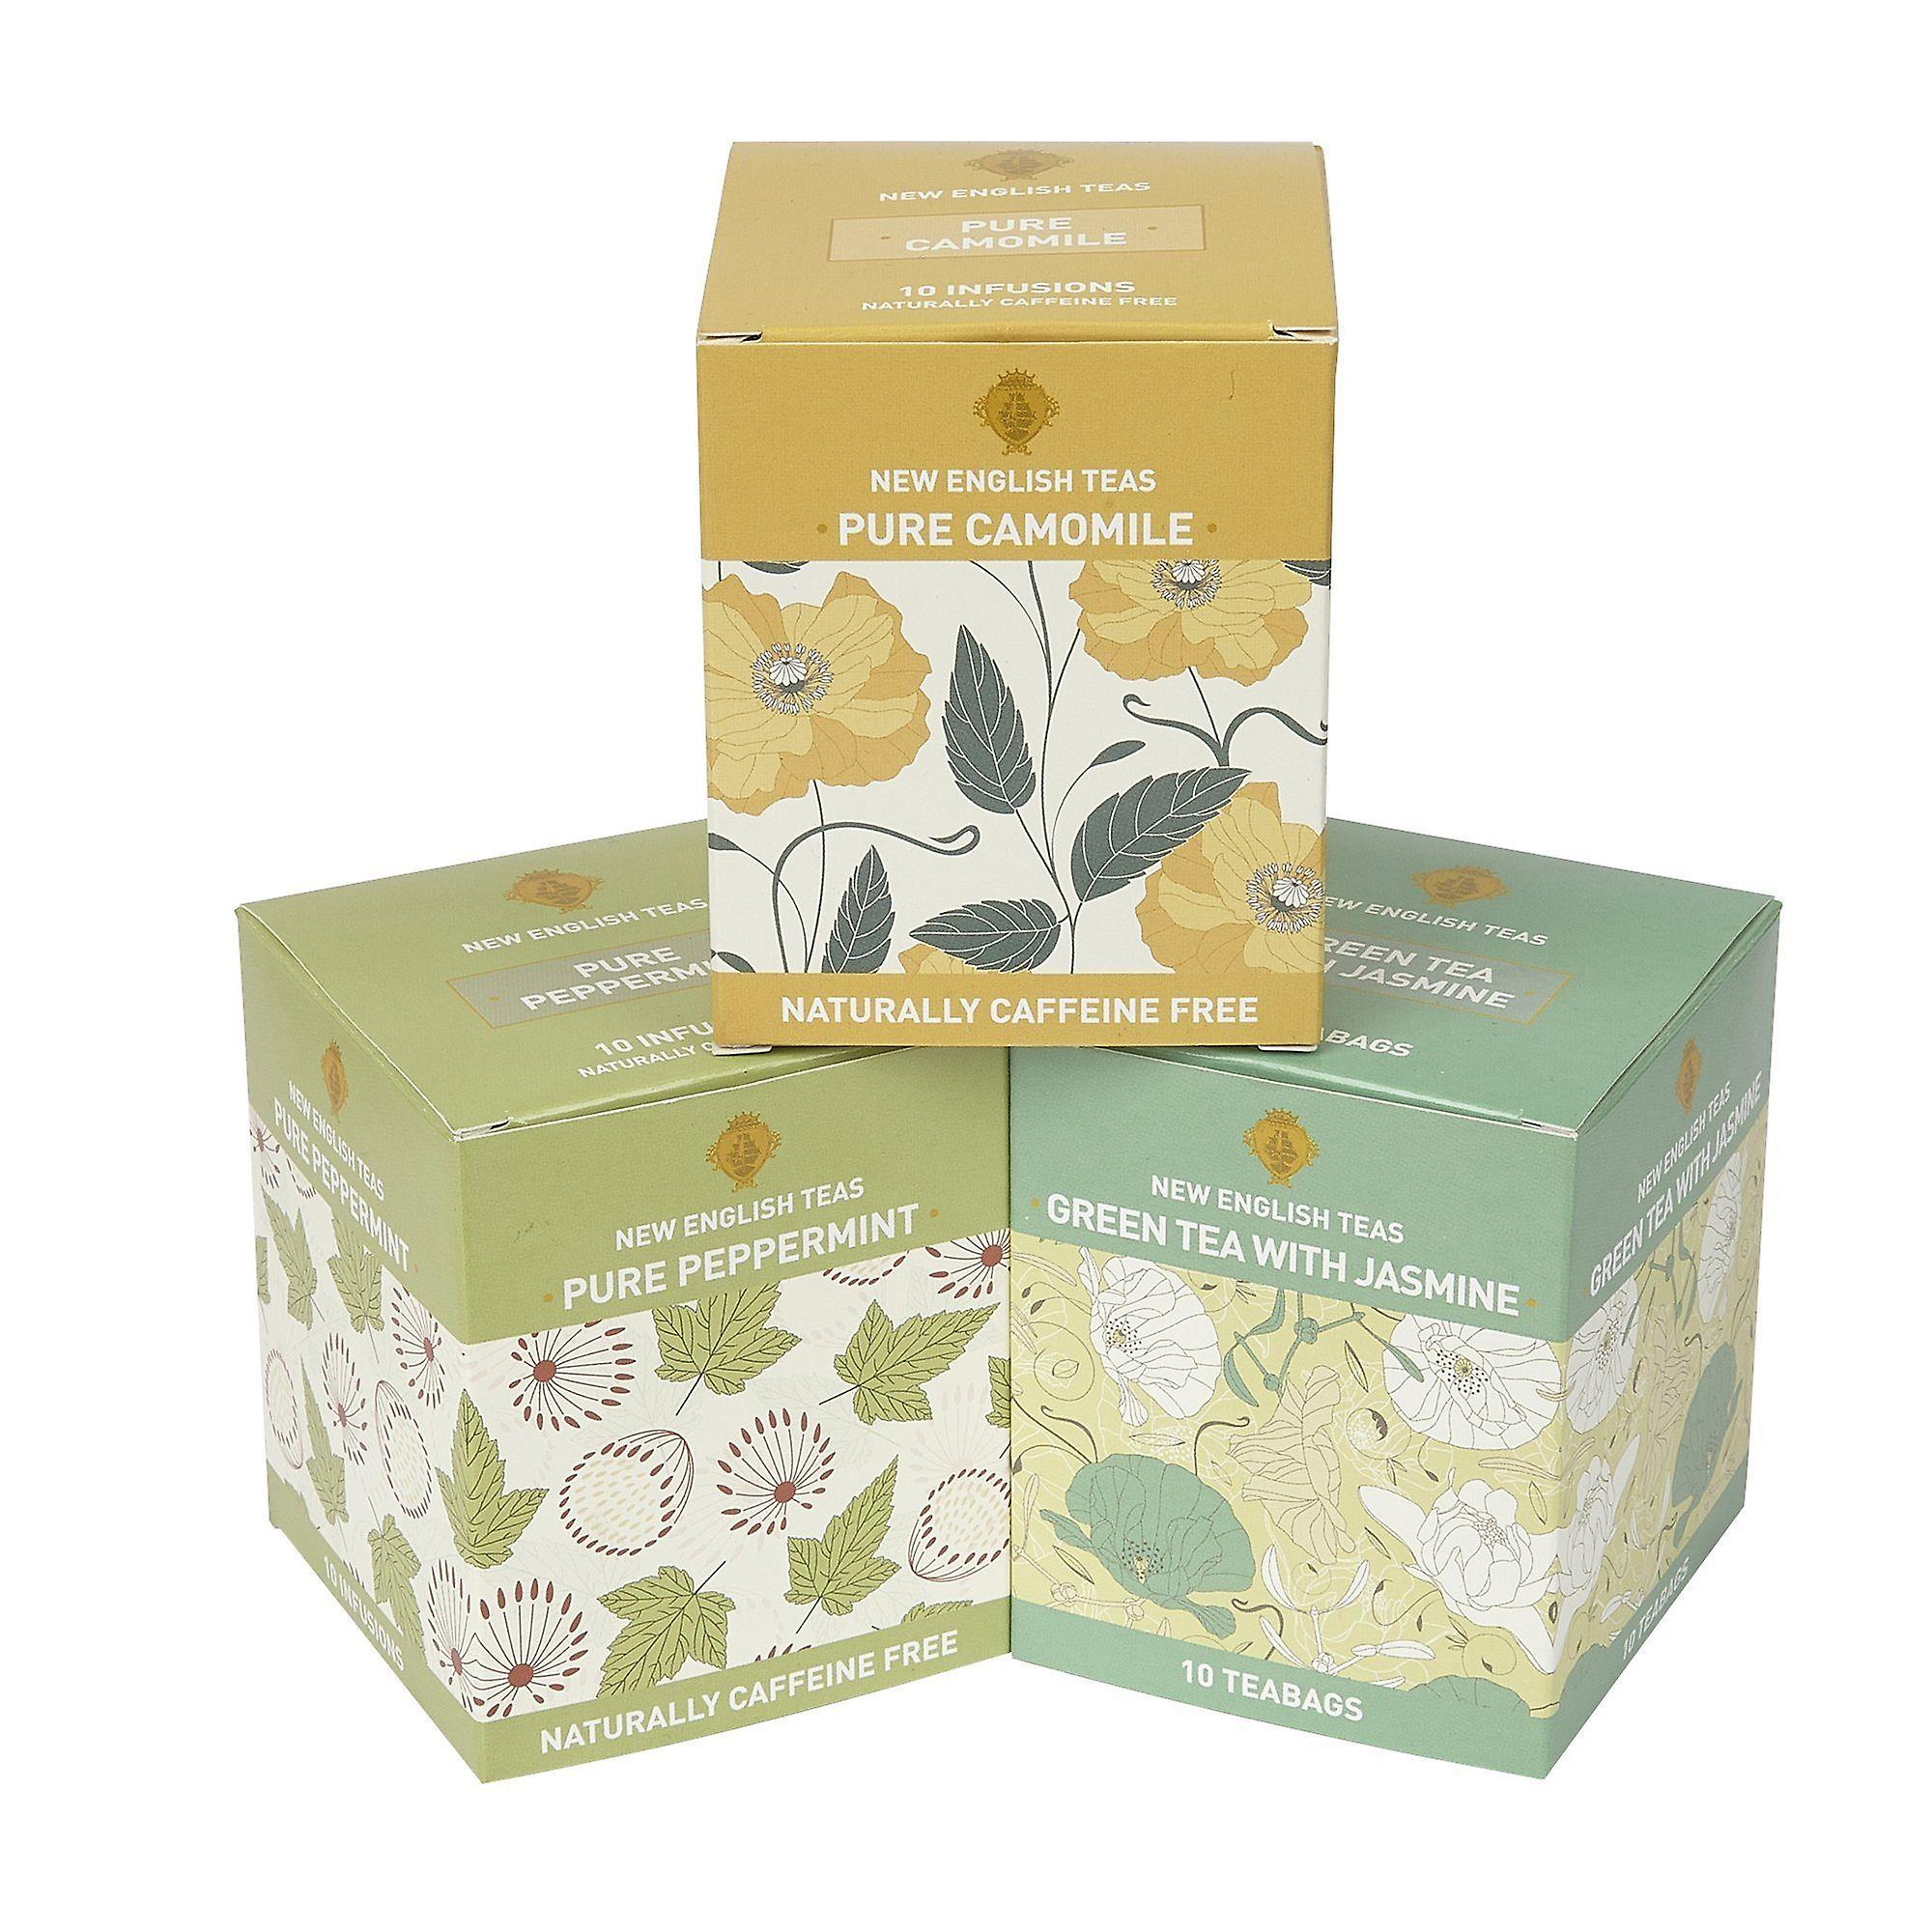 Wellbeing tea selection detox me 30 teabags